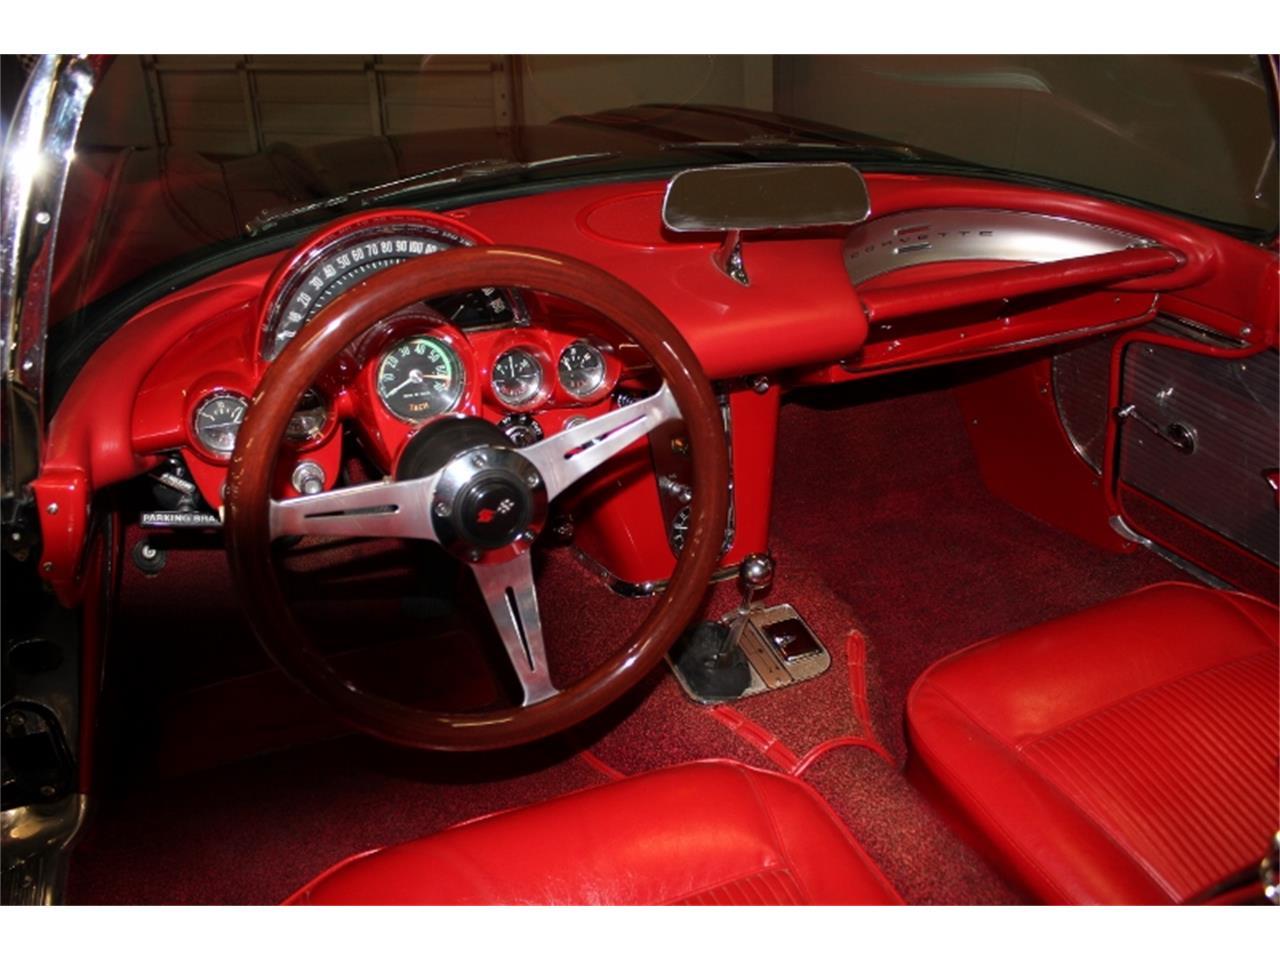 Large Picture of Classic 1961 Chevrolet Corvette - $90,000.00 - KT5Z